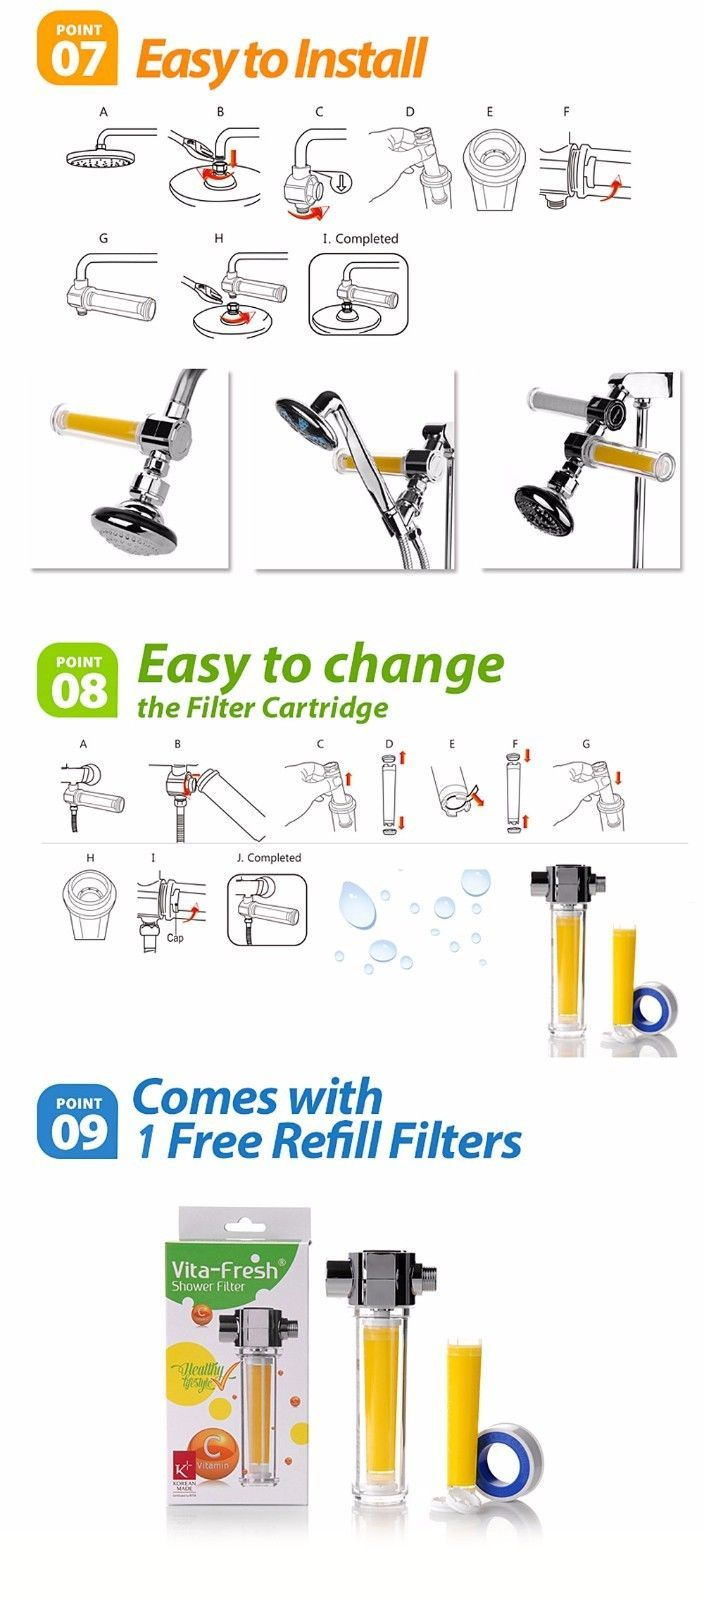 UBS VitaFresh Vita Gel Shower Filter with 4 Vitamin C Gel Cartridge